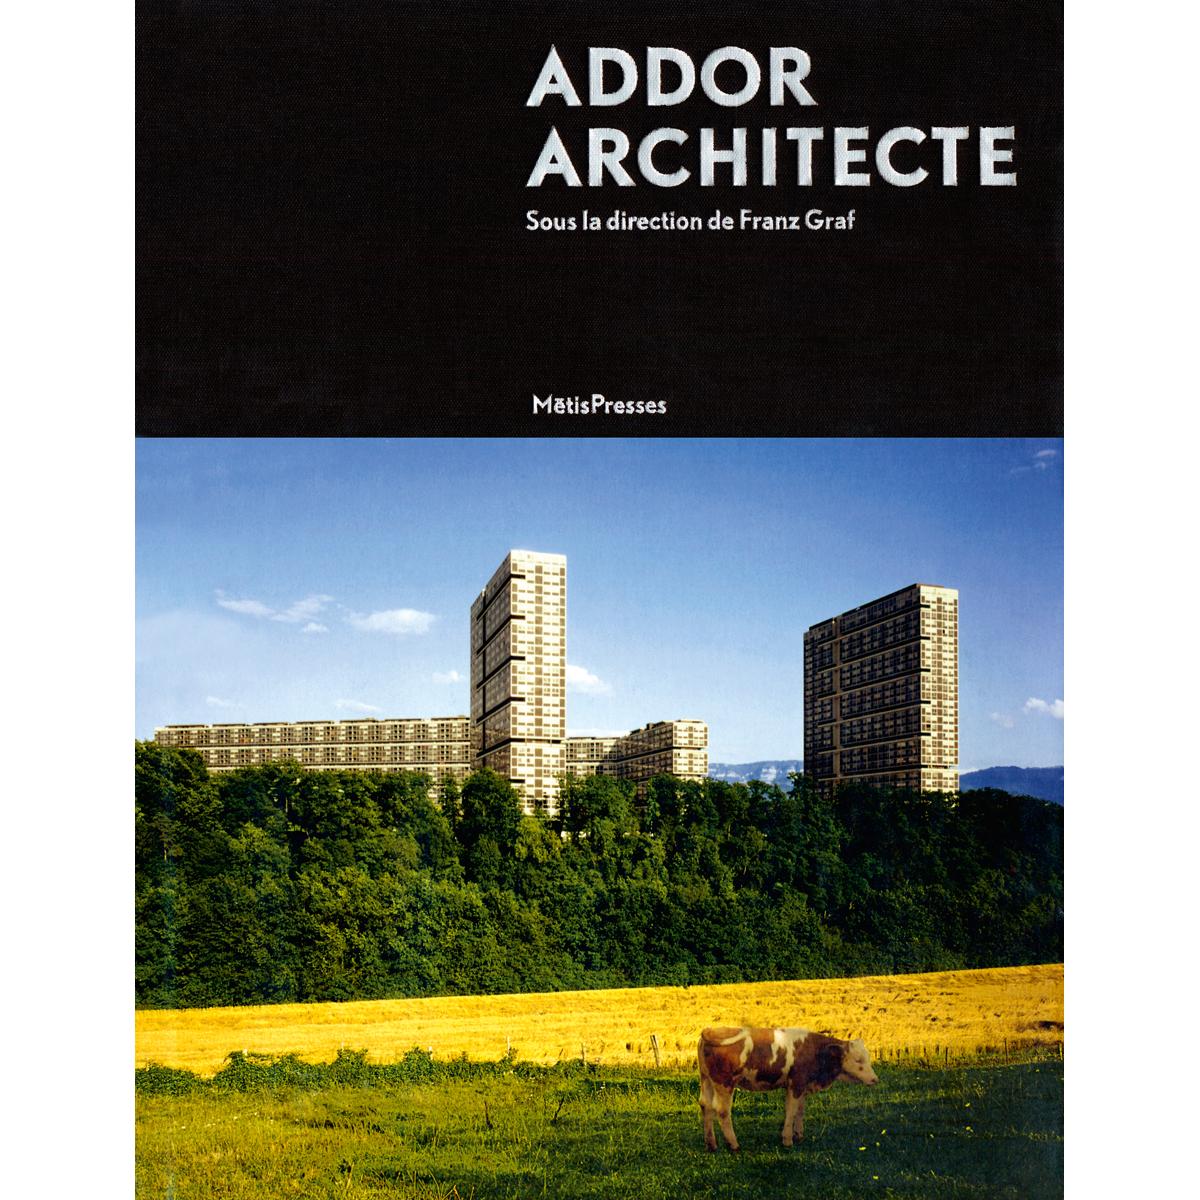 Addor Architecte